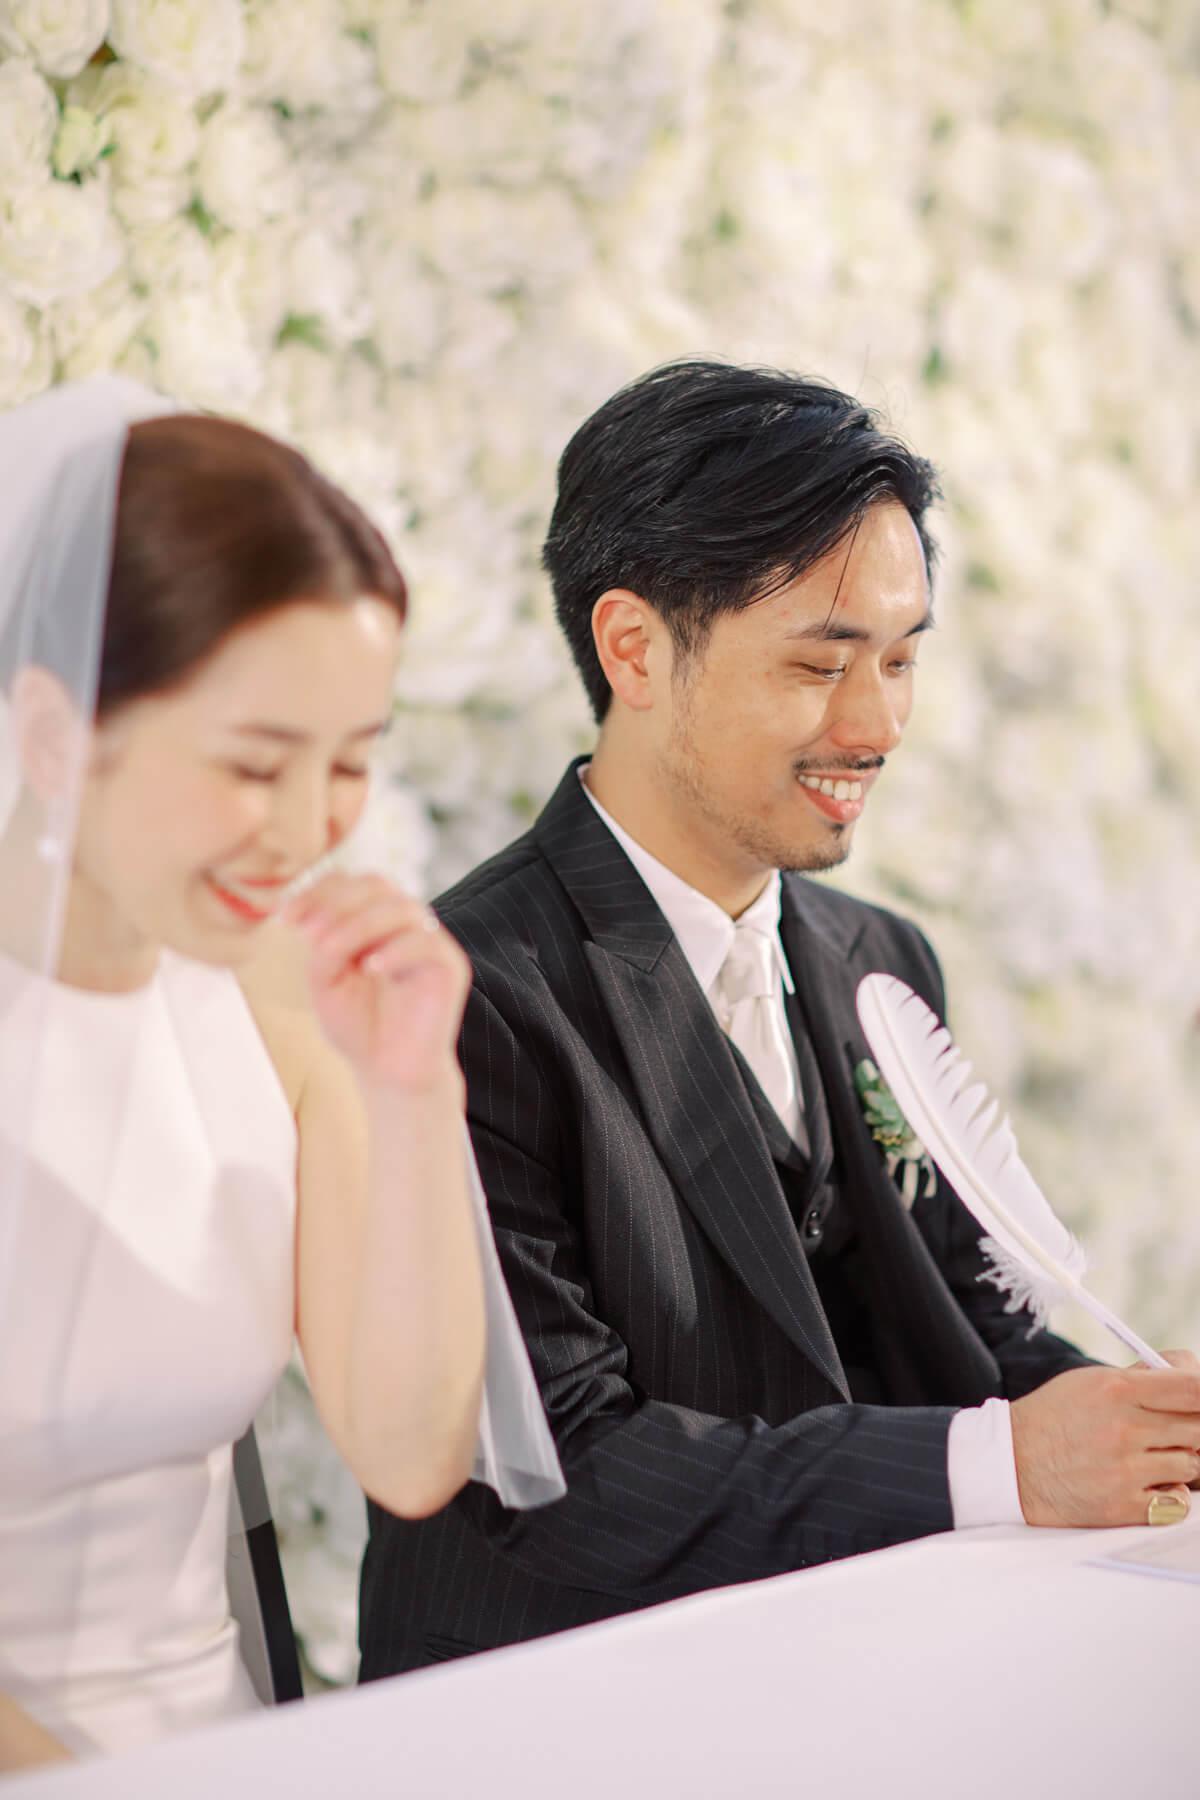 nikkiloveu-hongkong-weddingday-theupperhouse-as-016.jpg